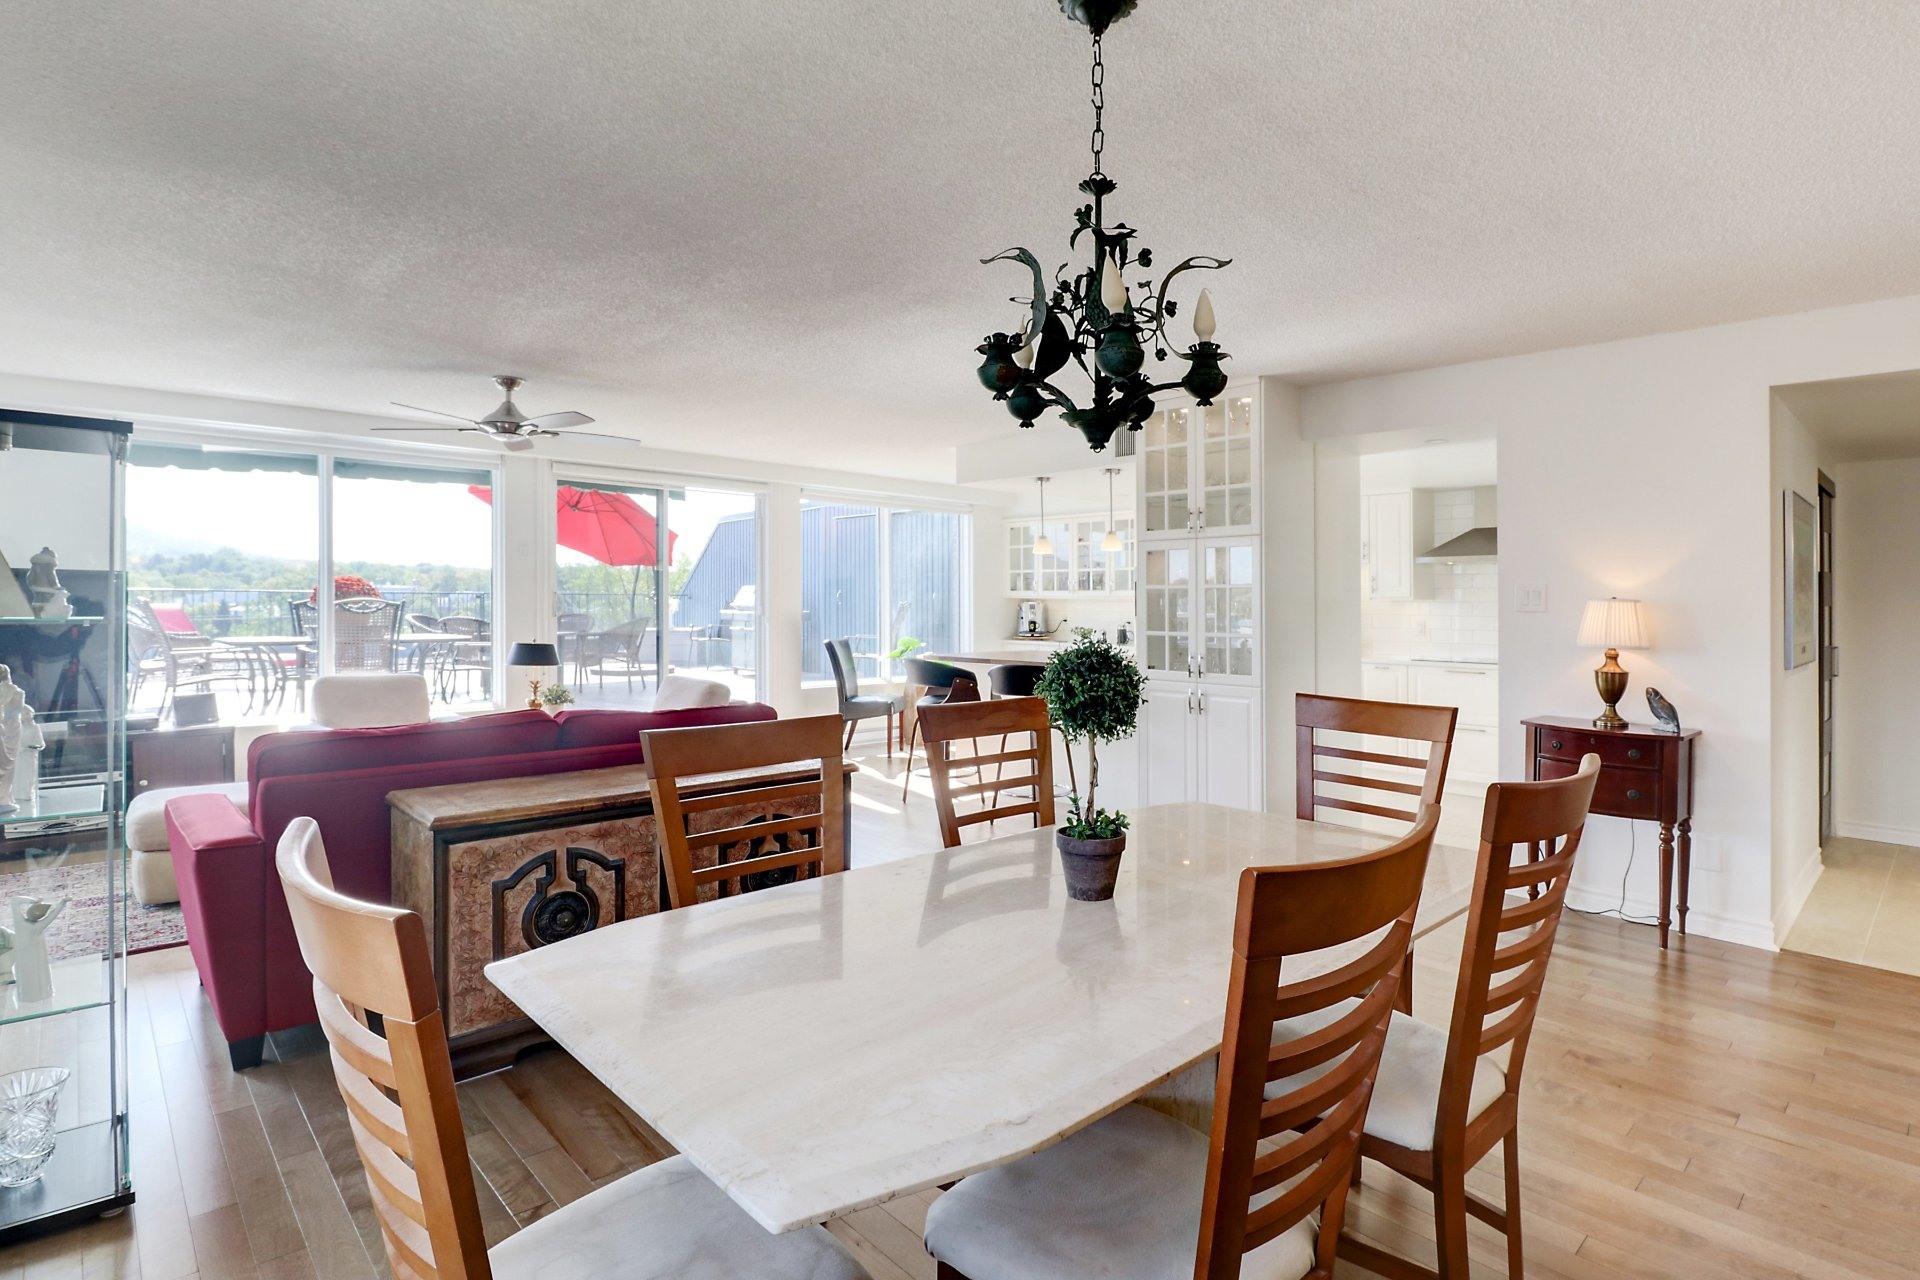 image 10 - Apartment For sale Beloeil - 9 rooms